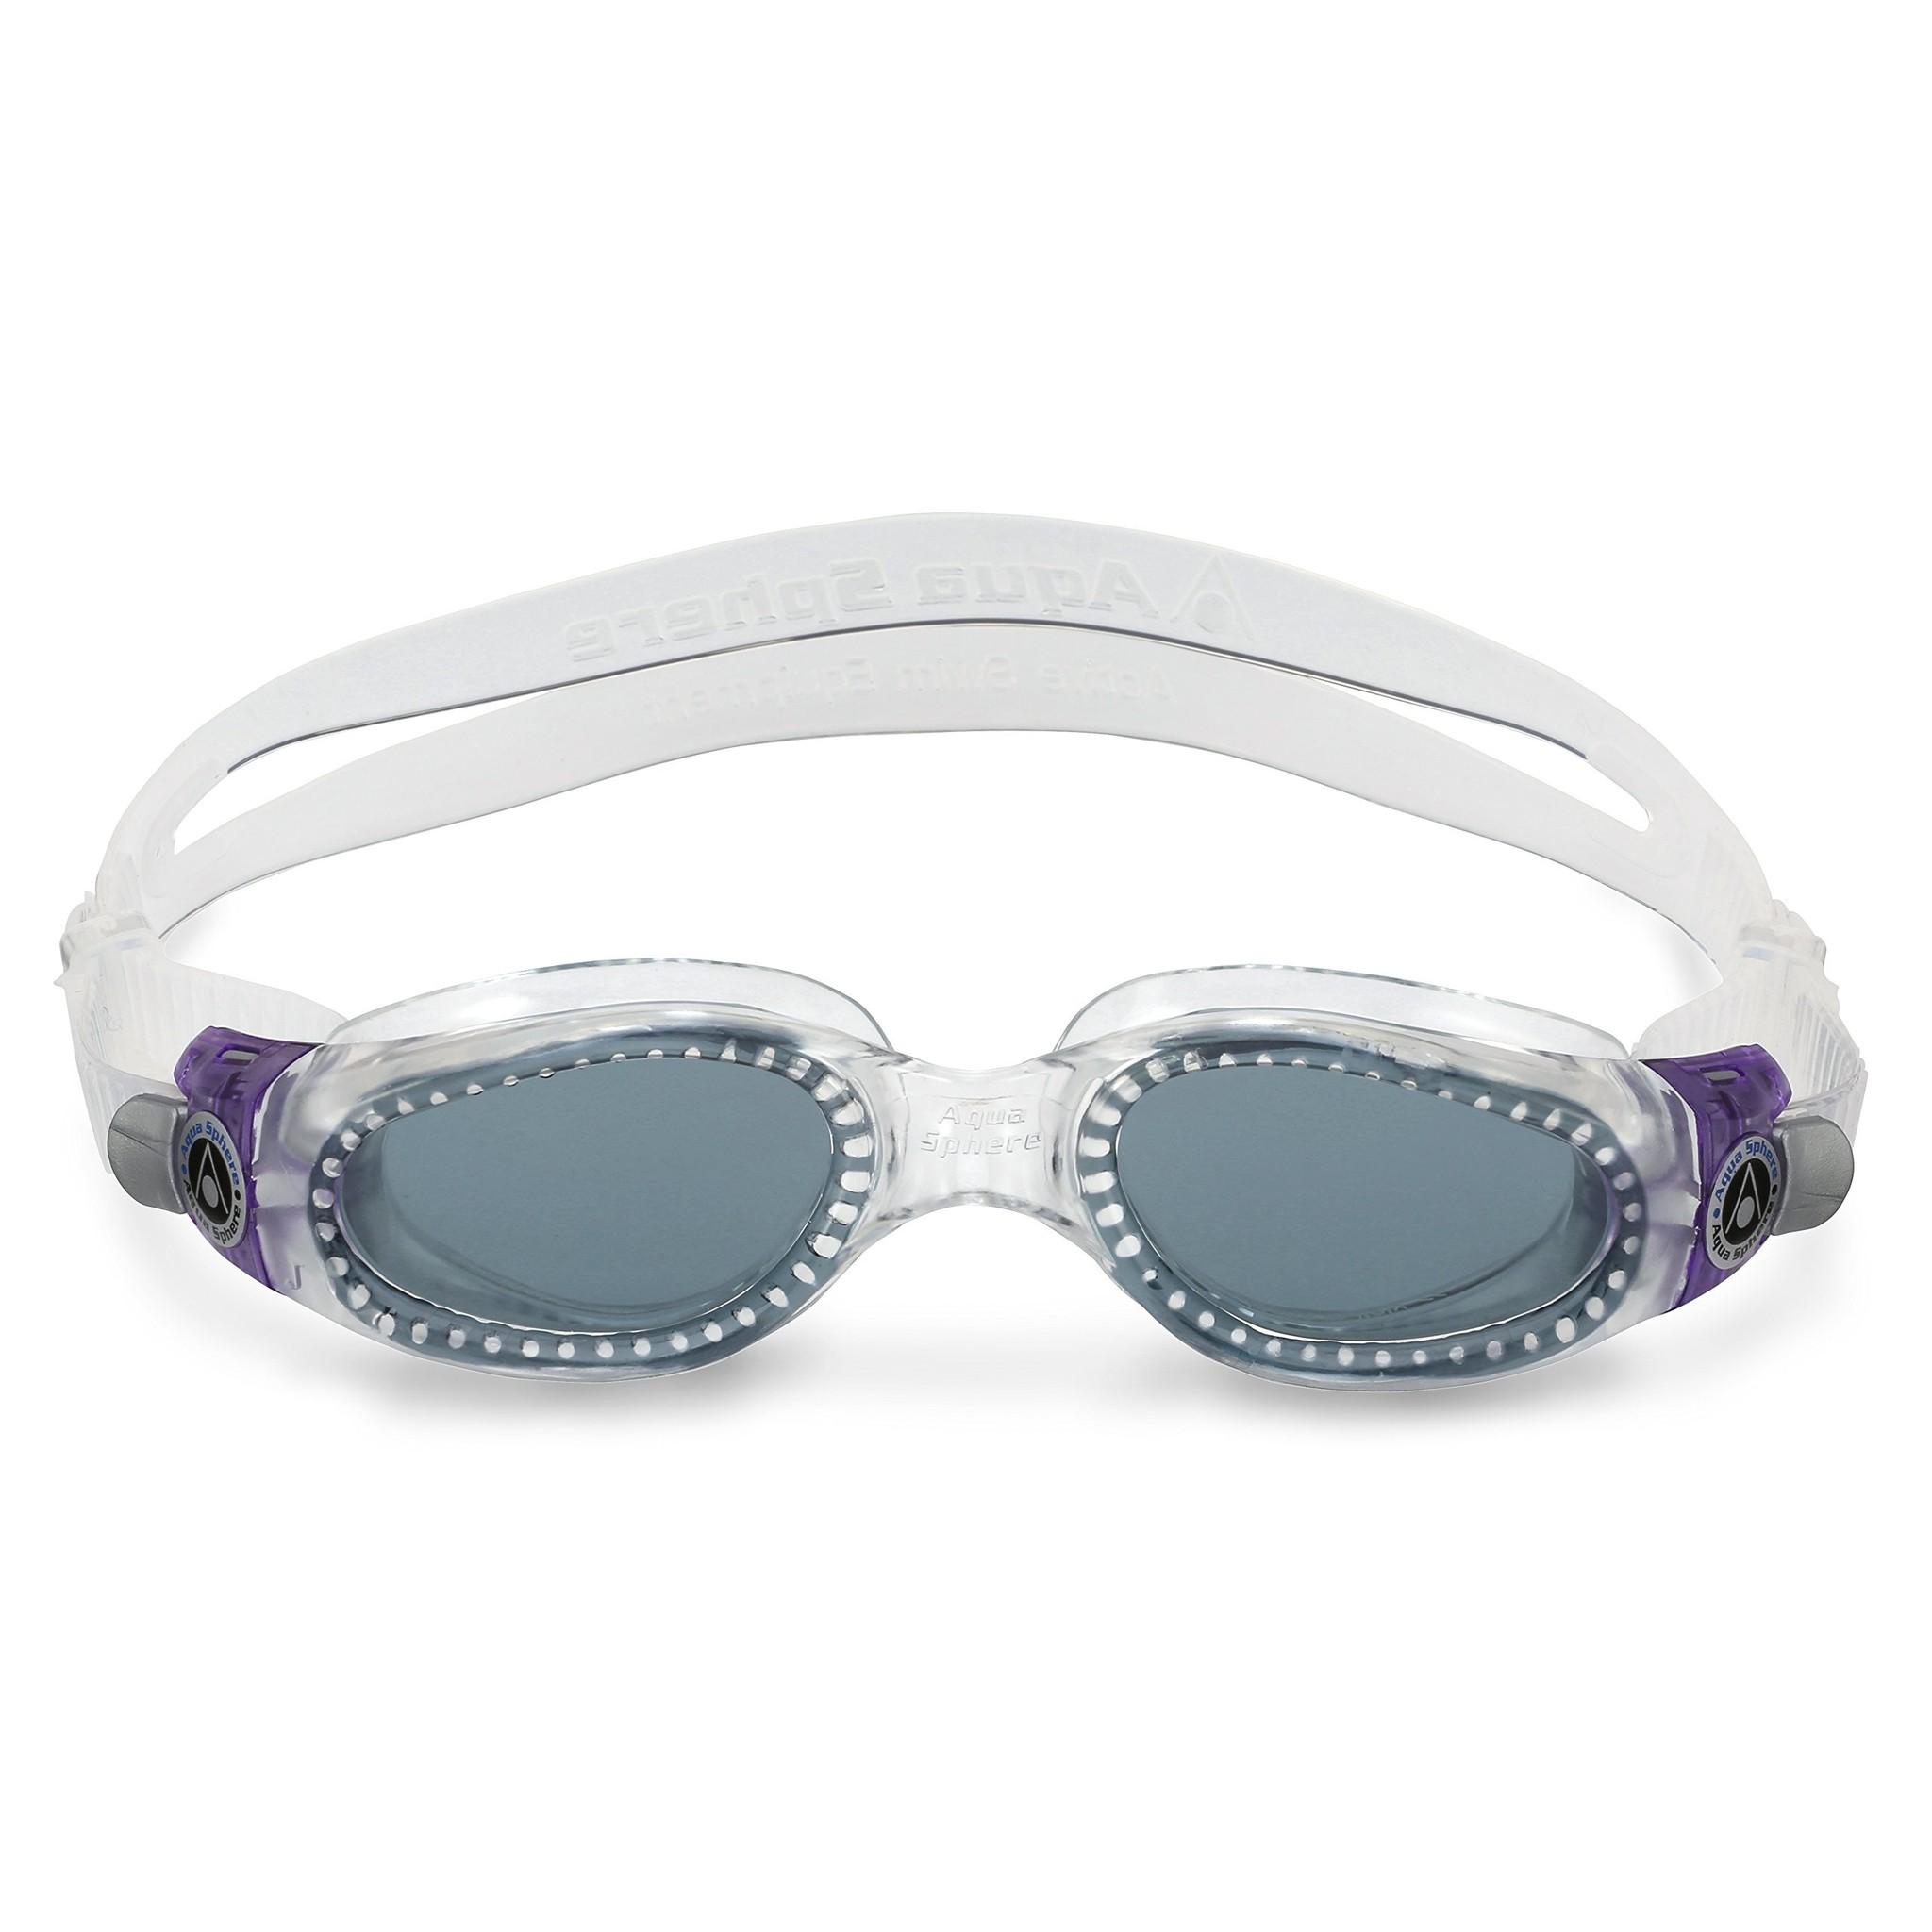 Aquasphere Aquasphere Kaiman Lady Goggle